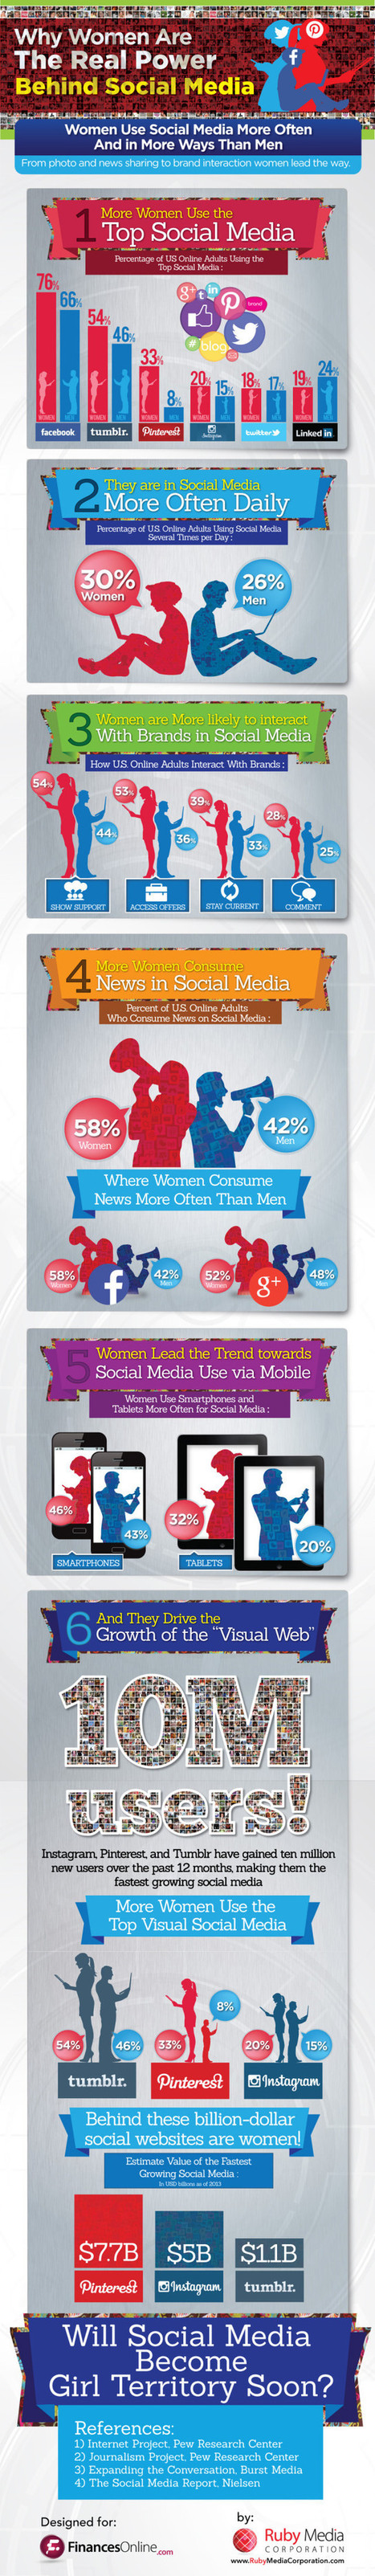 Real Power Behind Social Media? Women [Infographic] - Marketing Technology Blog | Broadband Africa | Scoop.it